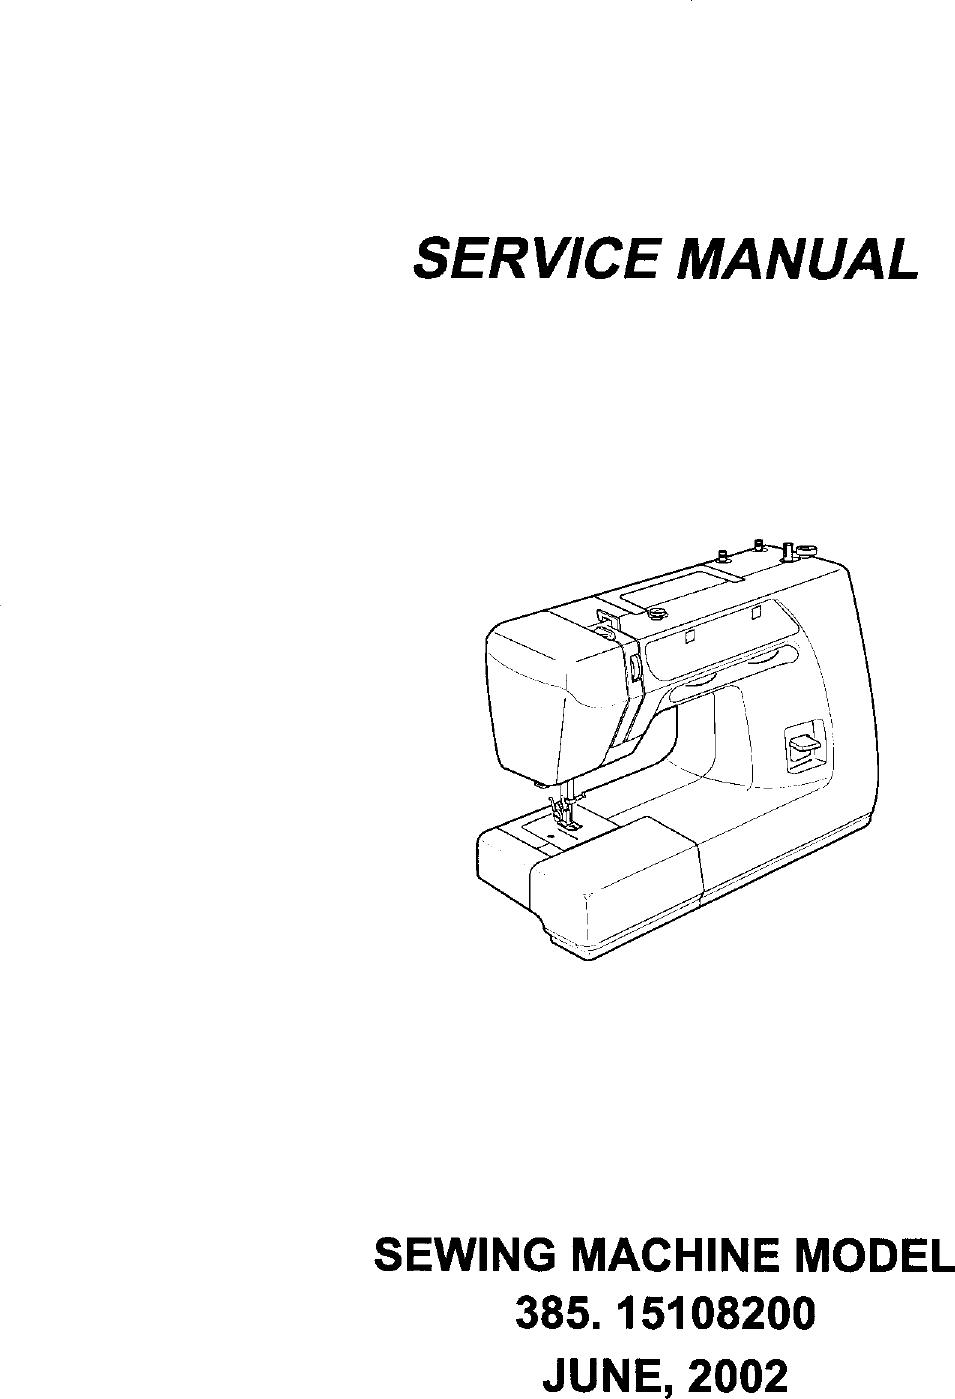 Kenmore 38515108200 User Manual SEWING MACHINE Manuals And